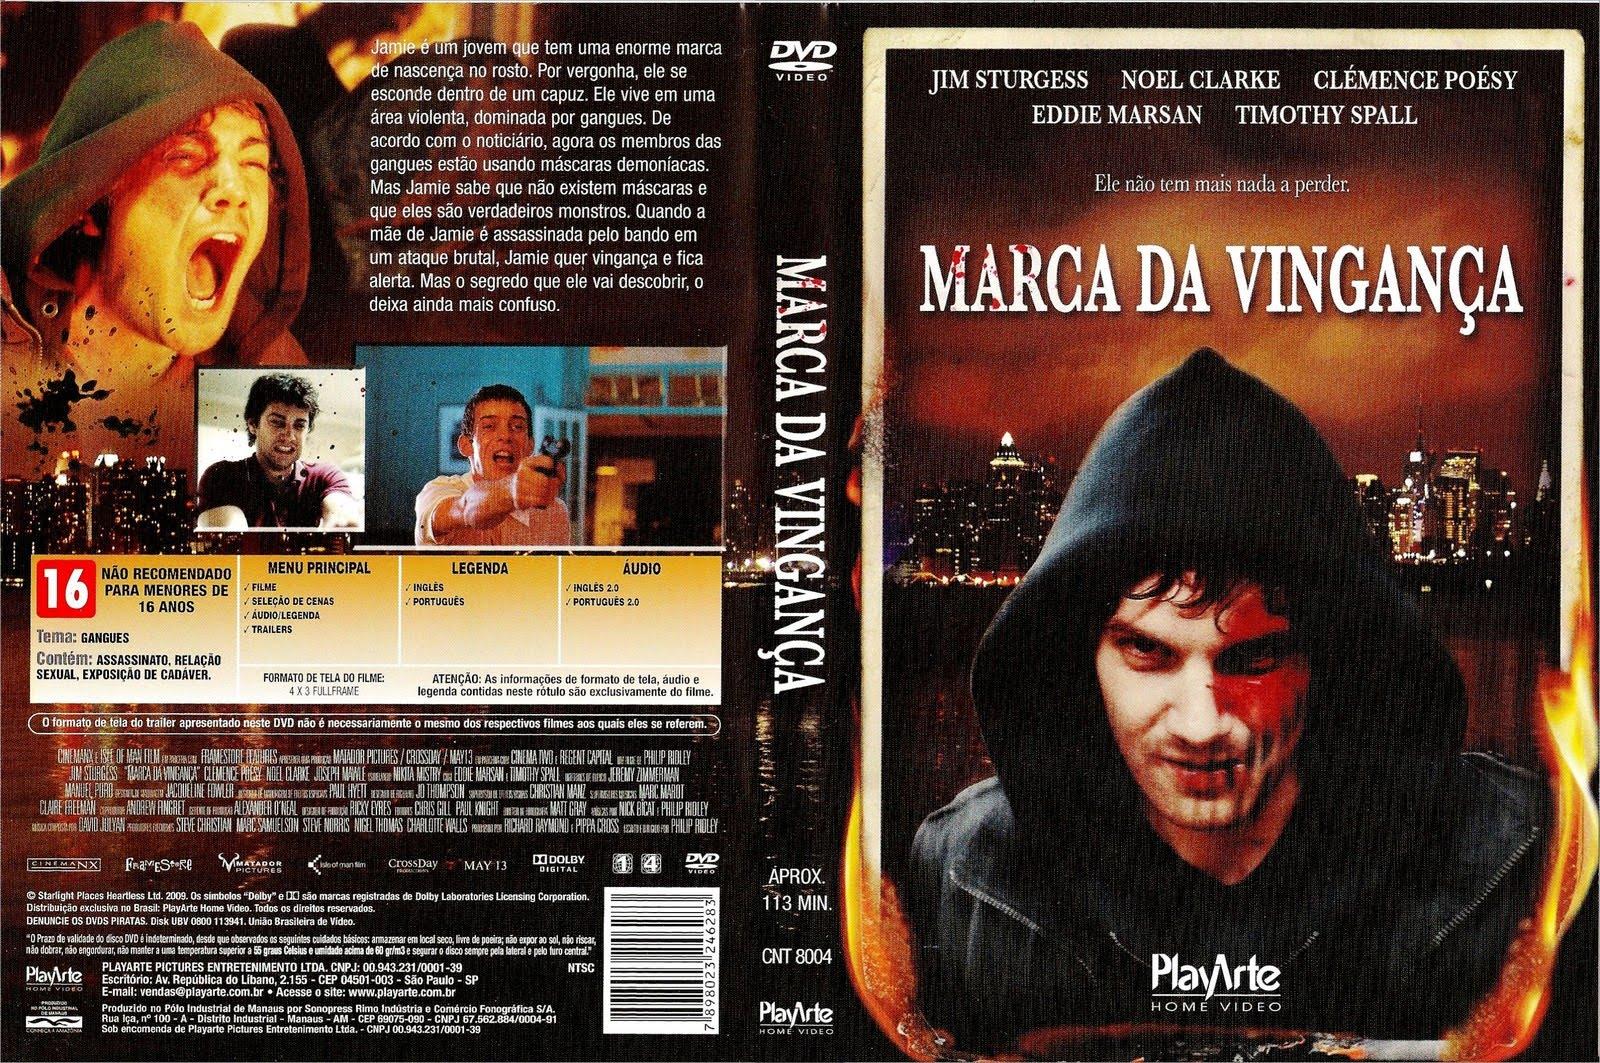 Filme Marcas Da Guerra within shadowz3n: filme: marca da vingança